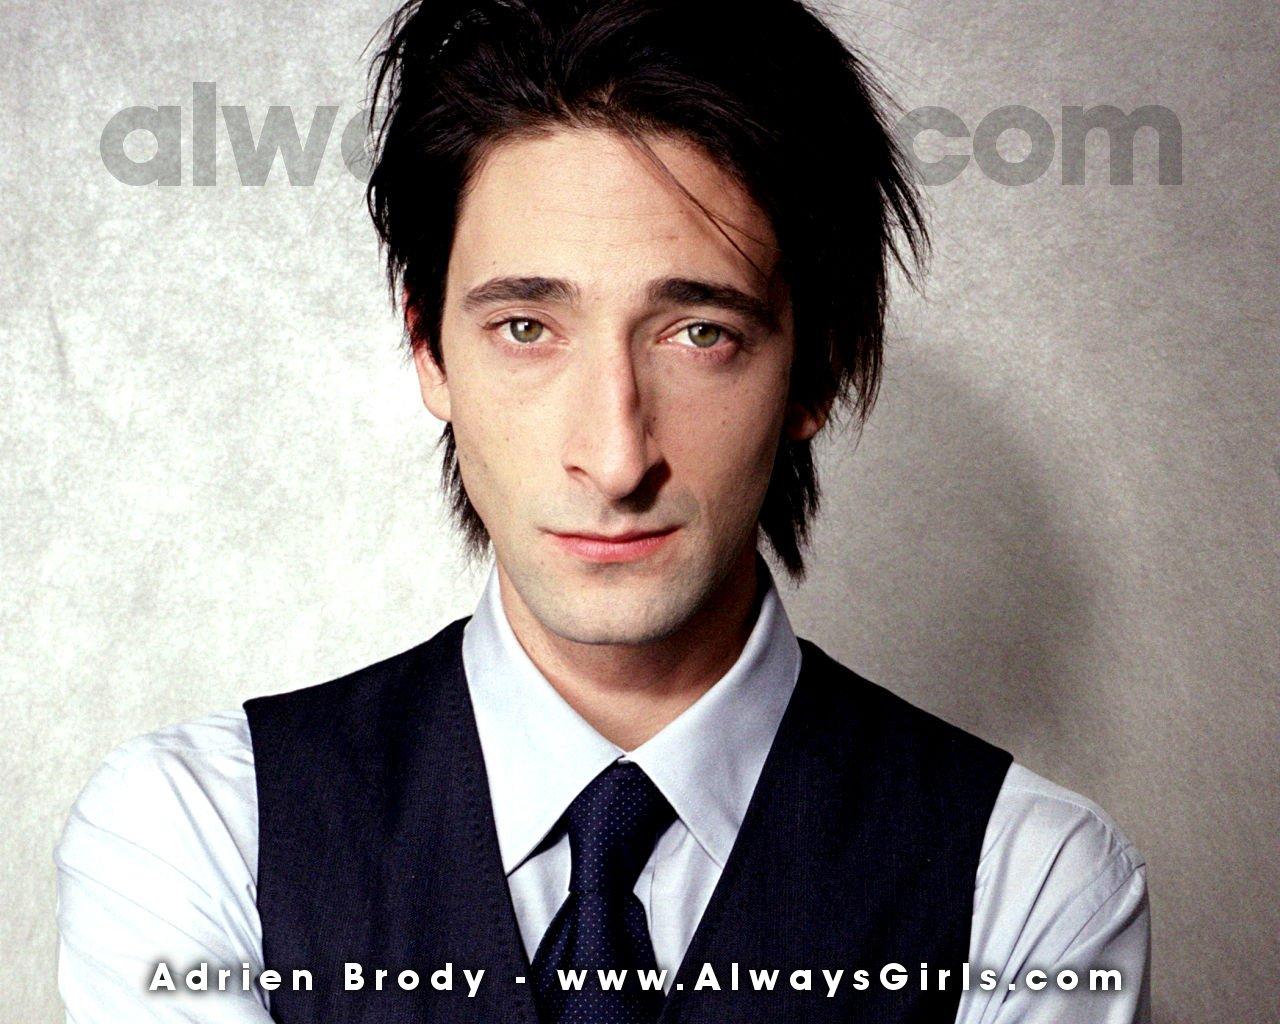 Adrien Brody - Adrien Brody Wallpaper (28530028) - Fanpop Adrien Brody